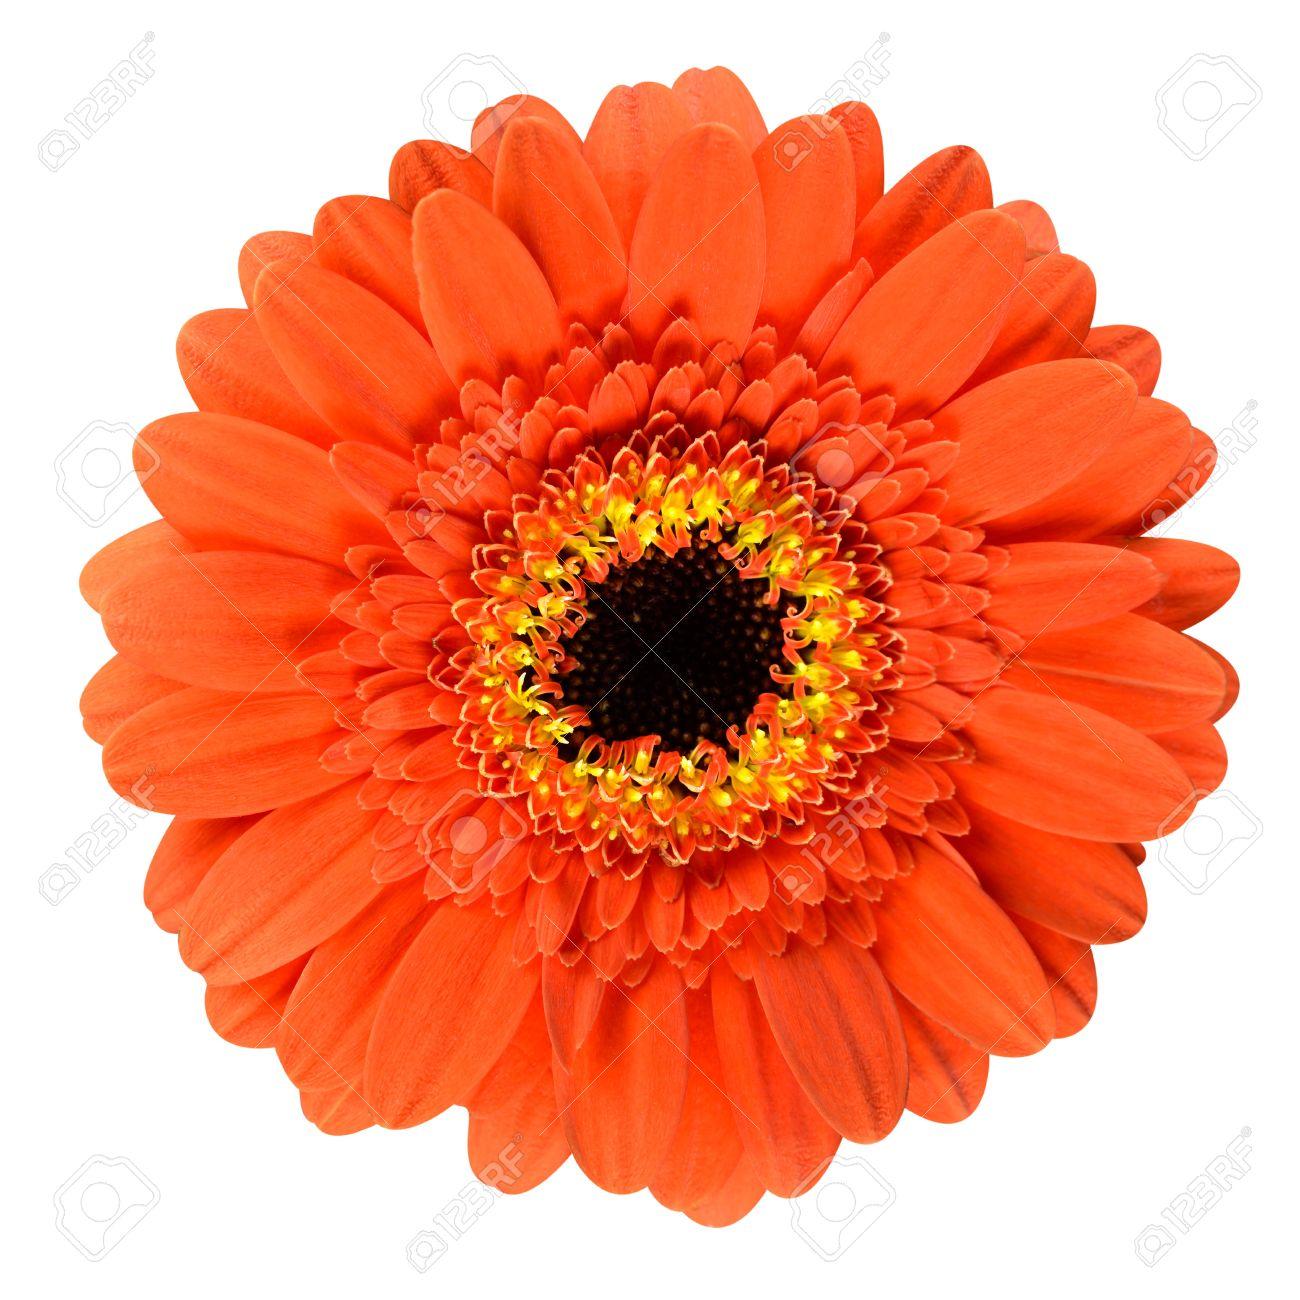 Beautiful orange gerbera flower with black center close up isolated beautiful orange gerbera flower with black center close up isolated on white background stock photo mightylinksfo